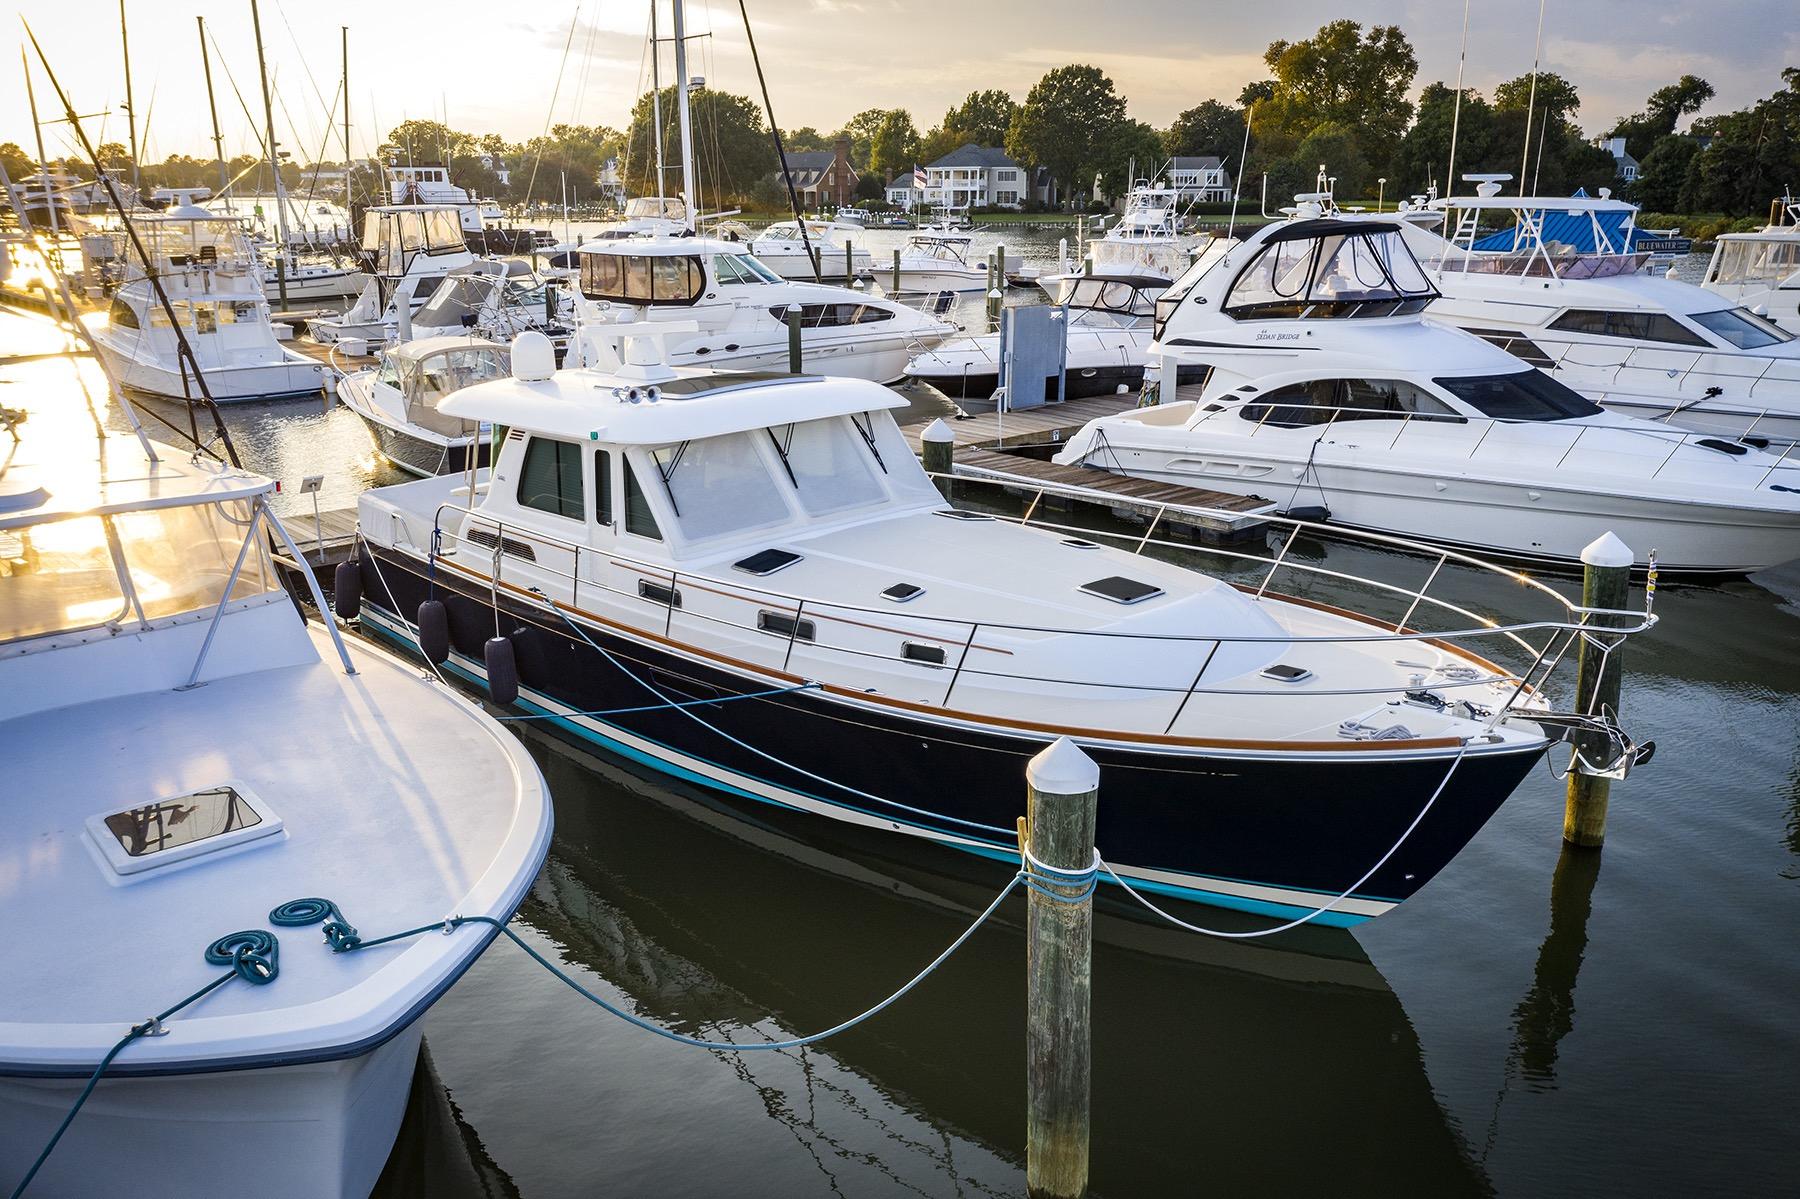 Miraculous 2016 Sabre 48 Salon Express Yacht For Sale Delta V Si Yachts Beatyapartments Chair Design Images Beatyapartmentscom